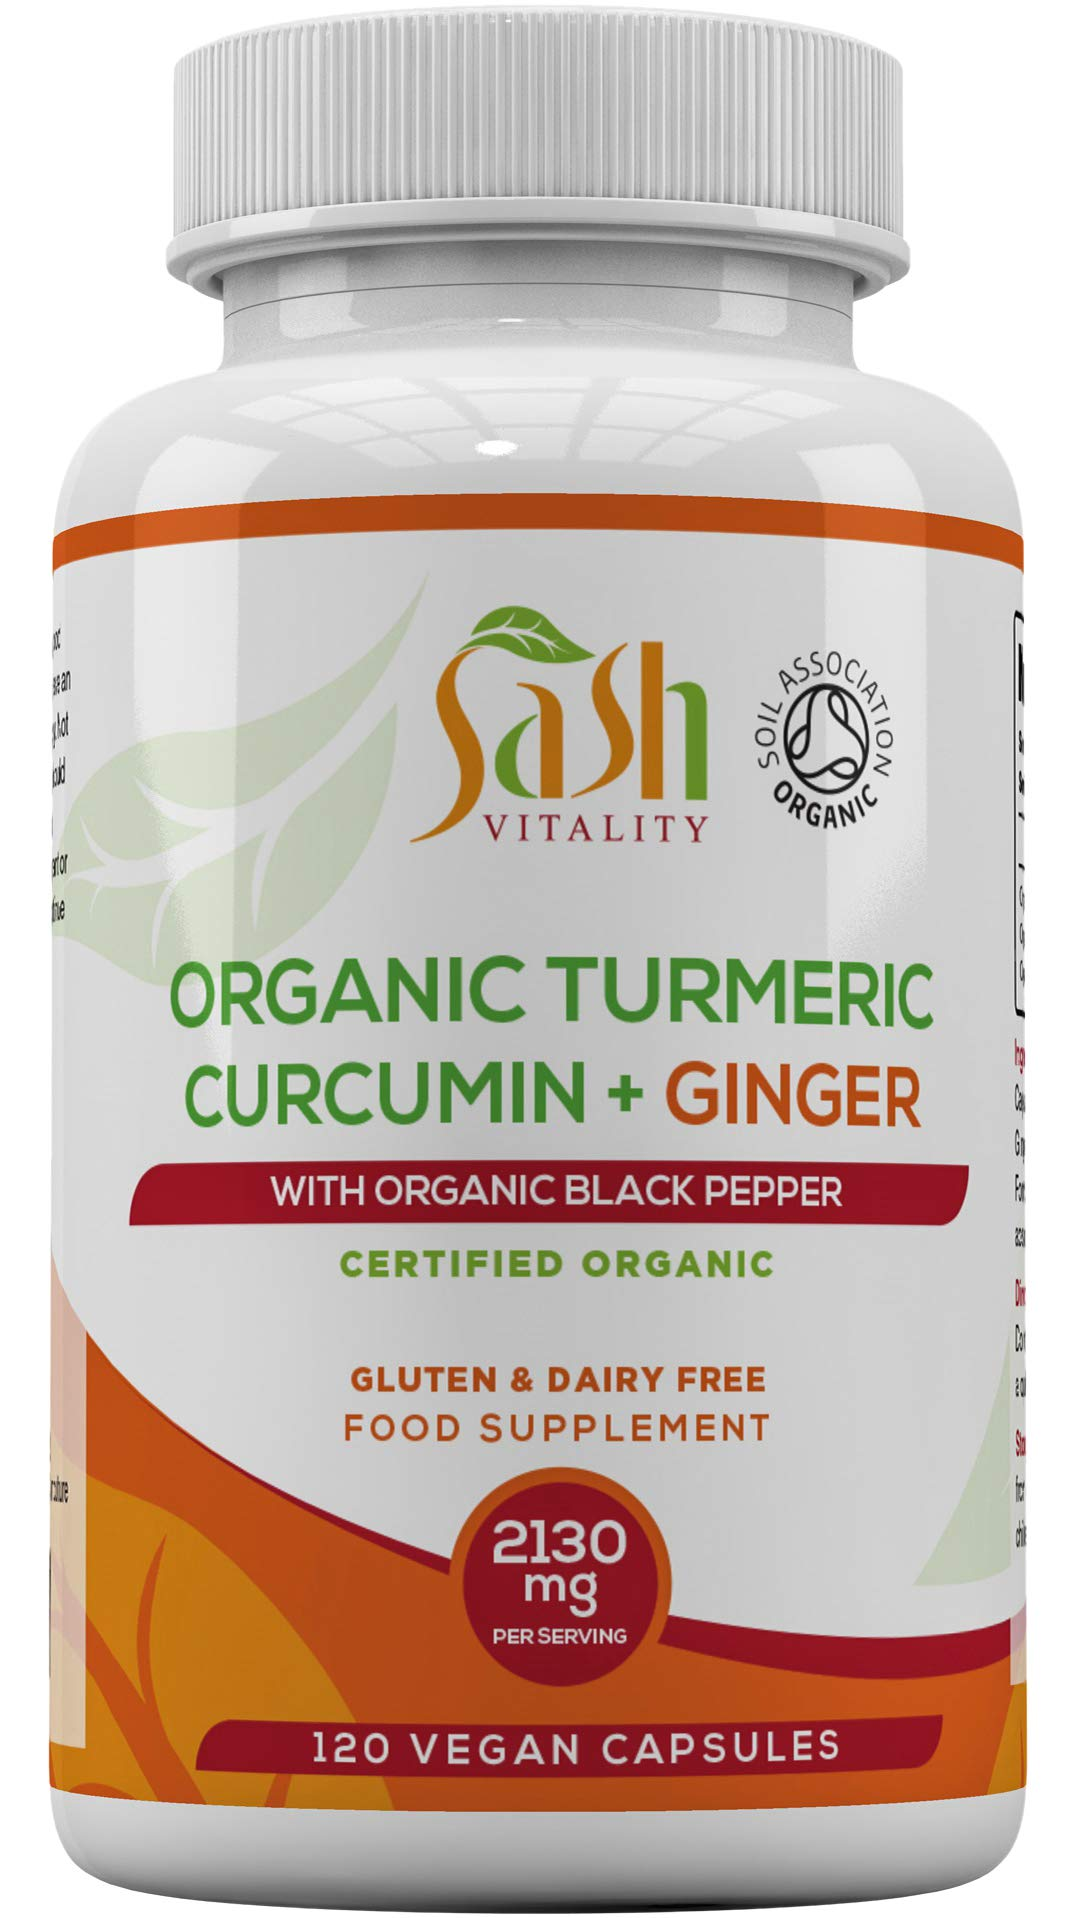 Organic Turmeric Curcumin 2130mg with Black Pepper & Ginger | 120 Vegan Turmeric Capsules High Strength | Immune System Support | Soil Association Certified Organic | UK Made Sash Vitality